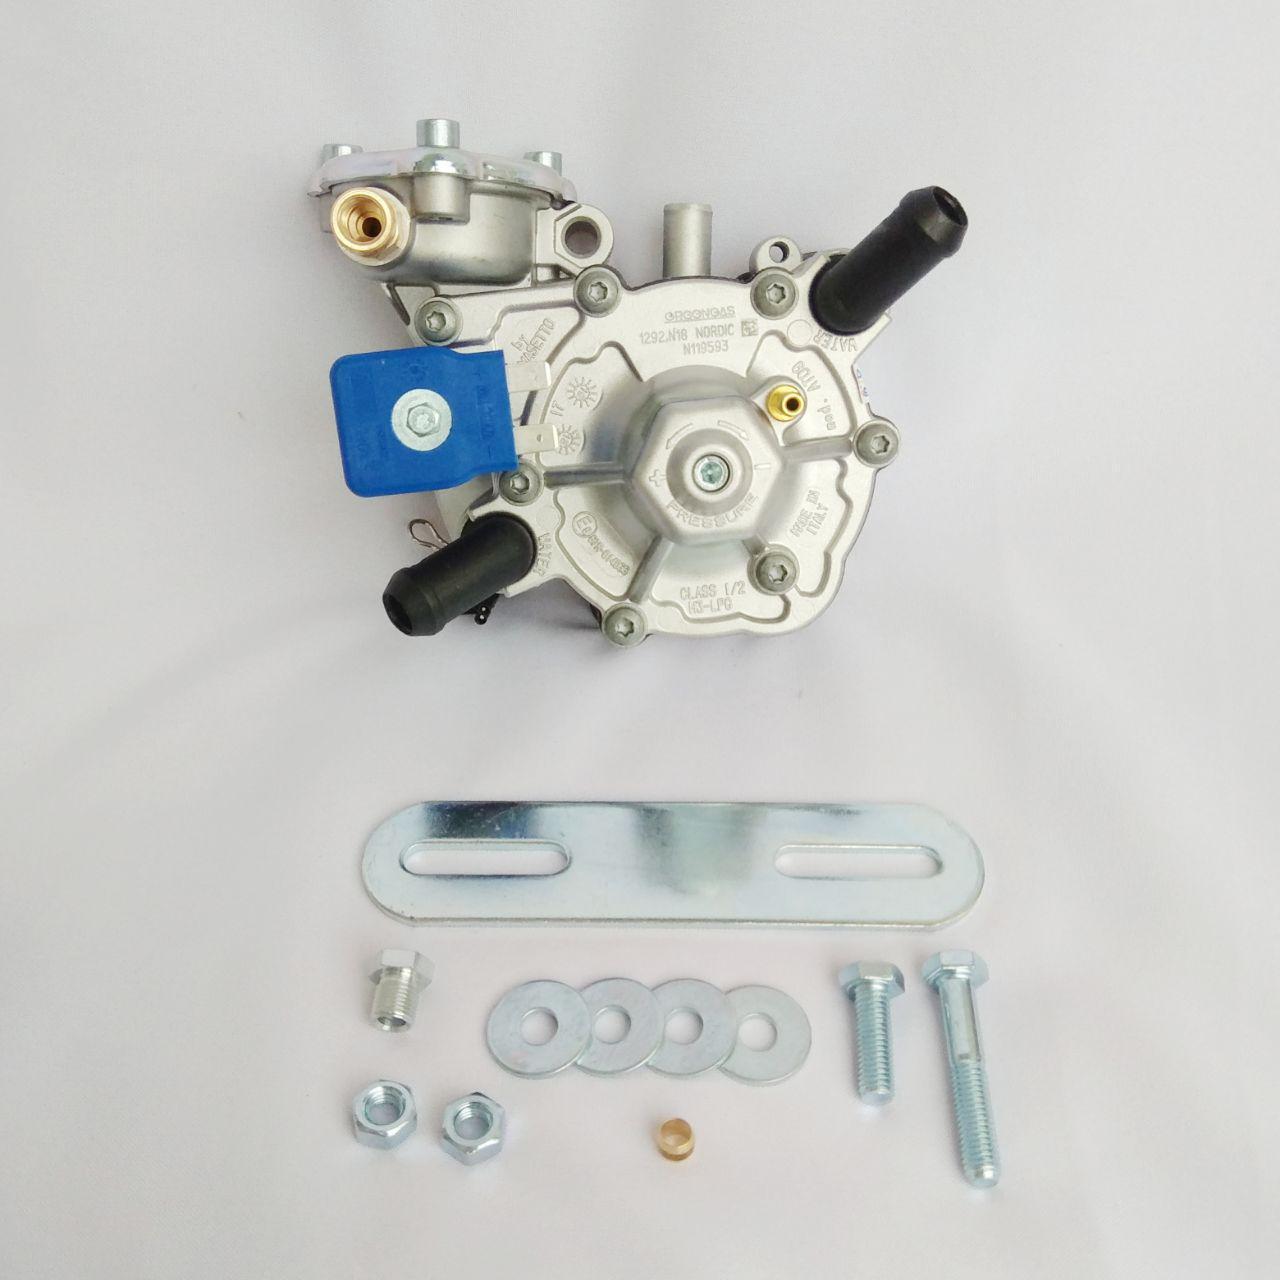 Газовый редуктор Tomasetto AT09 NORDIC до 125 кВт(170 л.с)